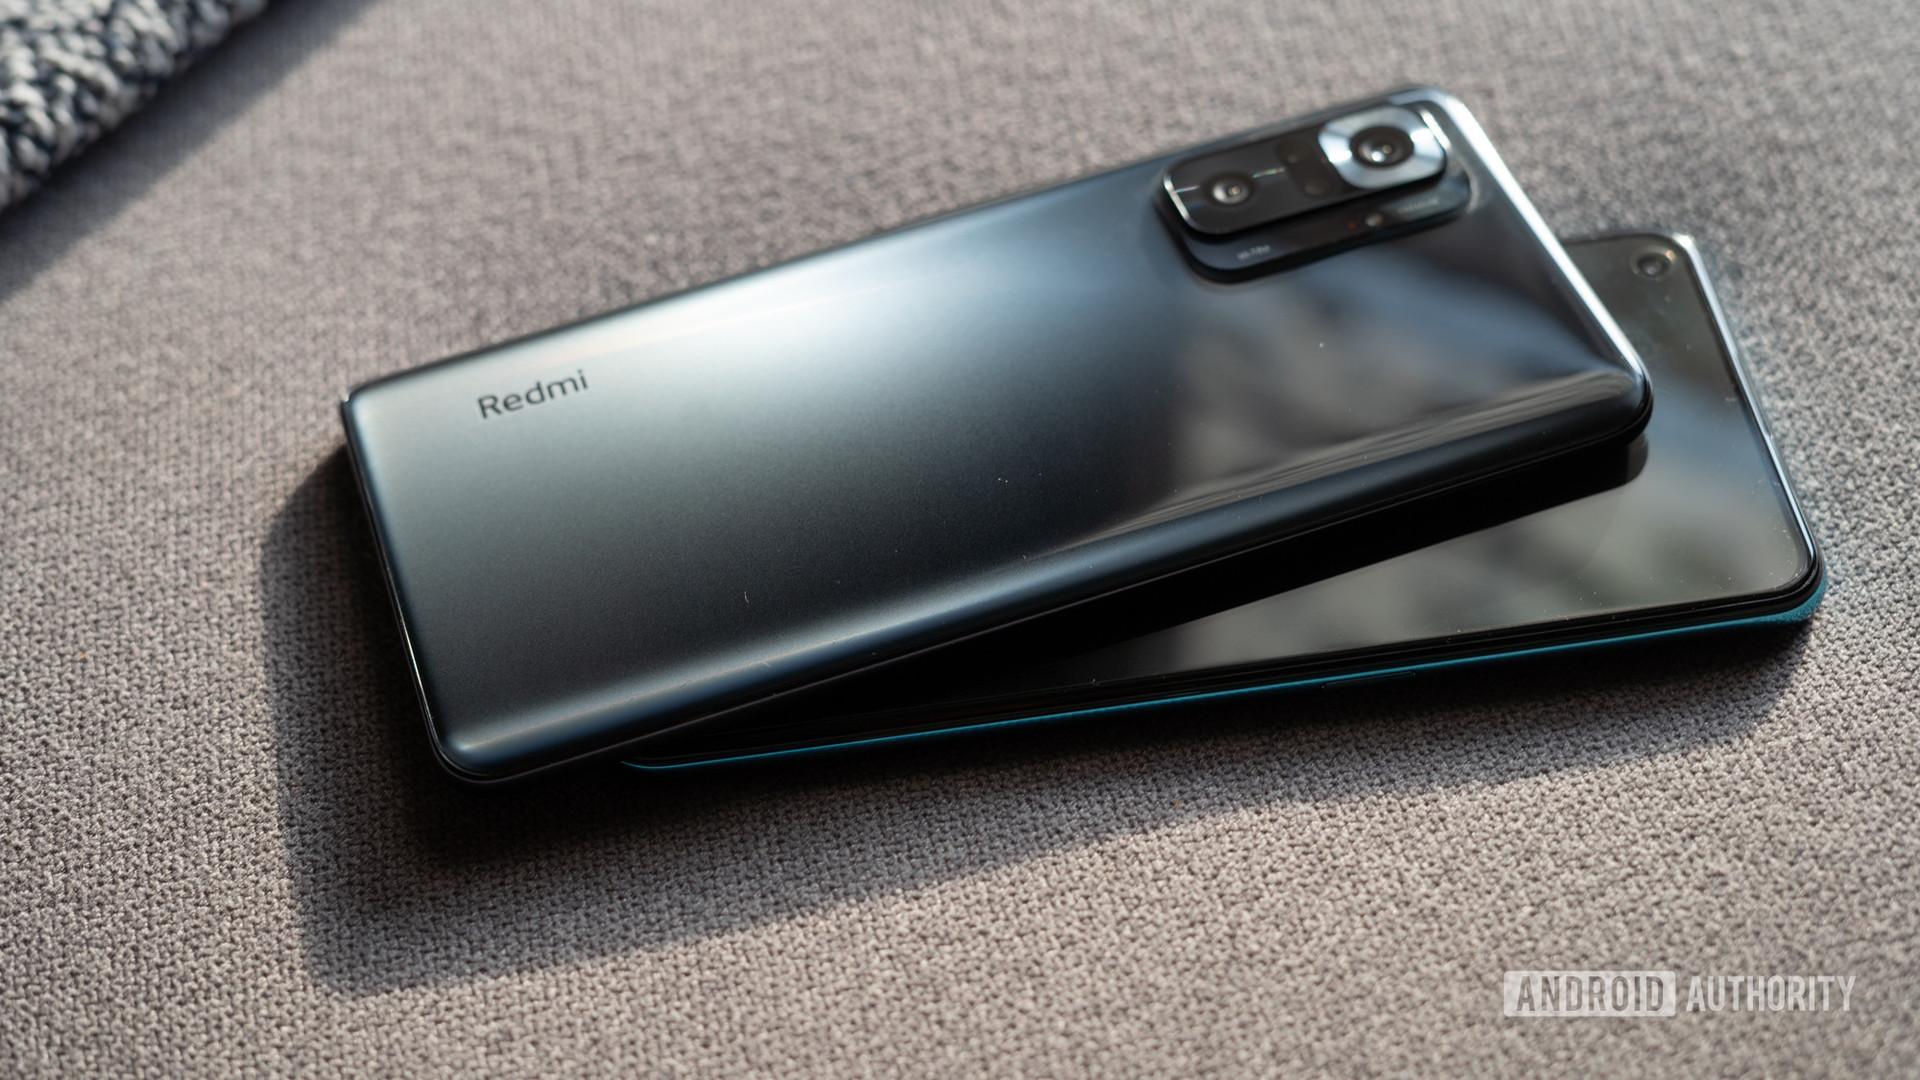 OnePlus Nord CE vs Redmi Note 10 Pro back panel